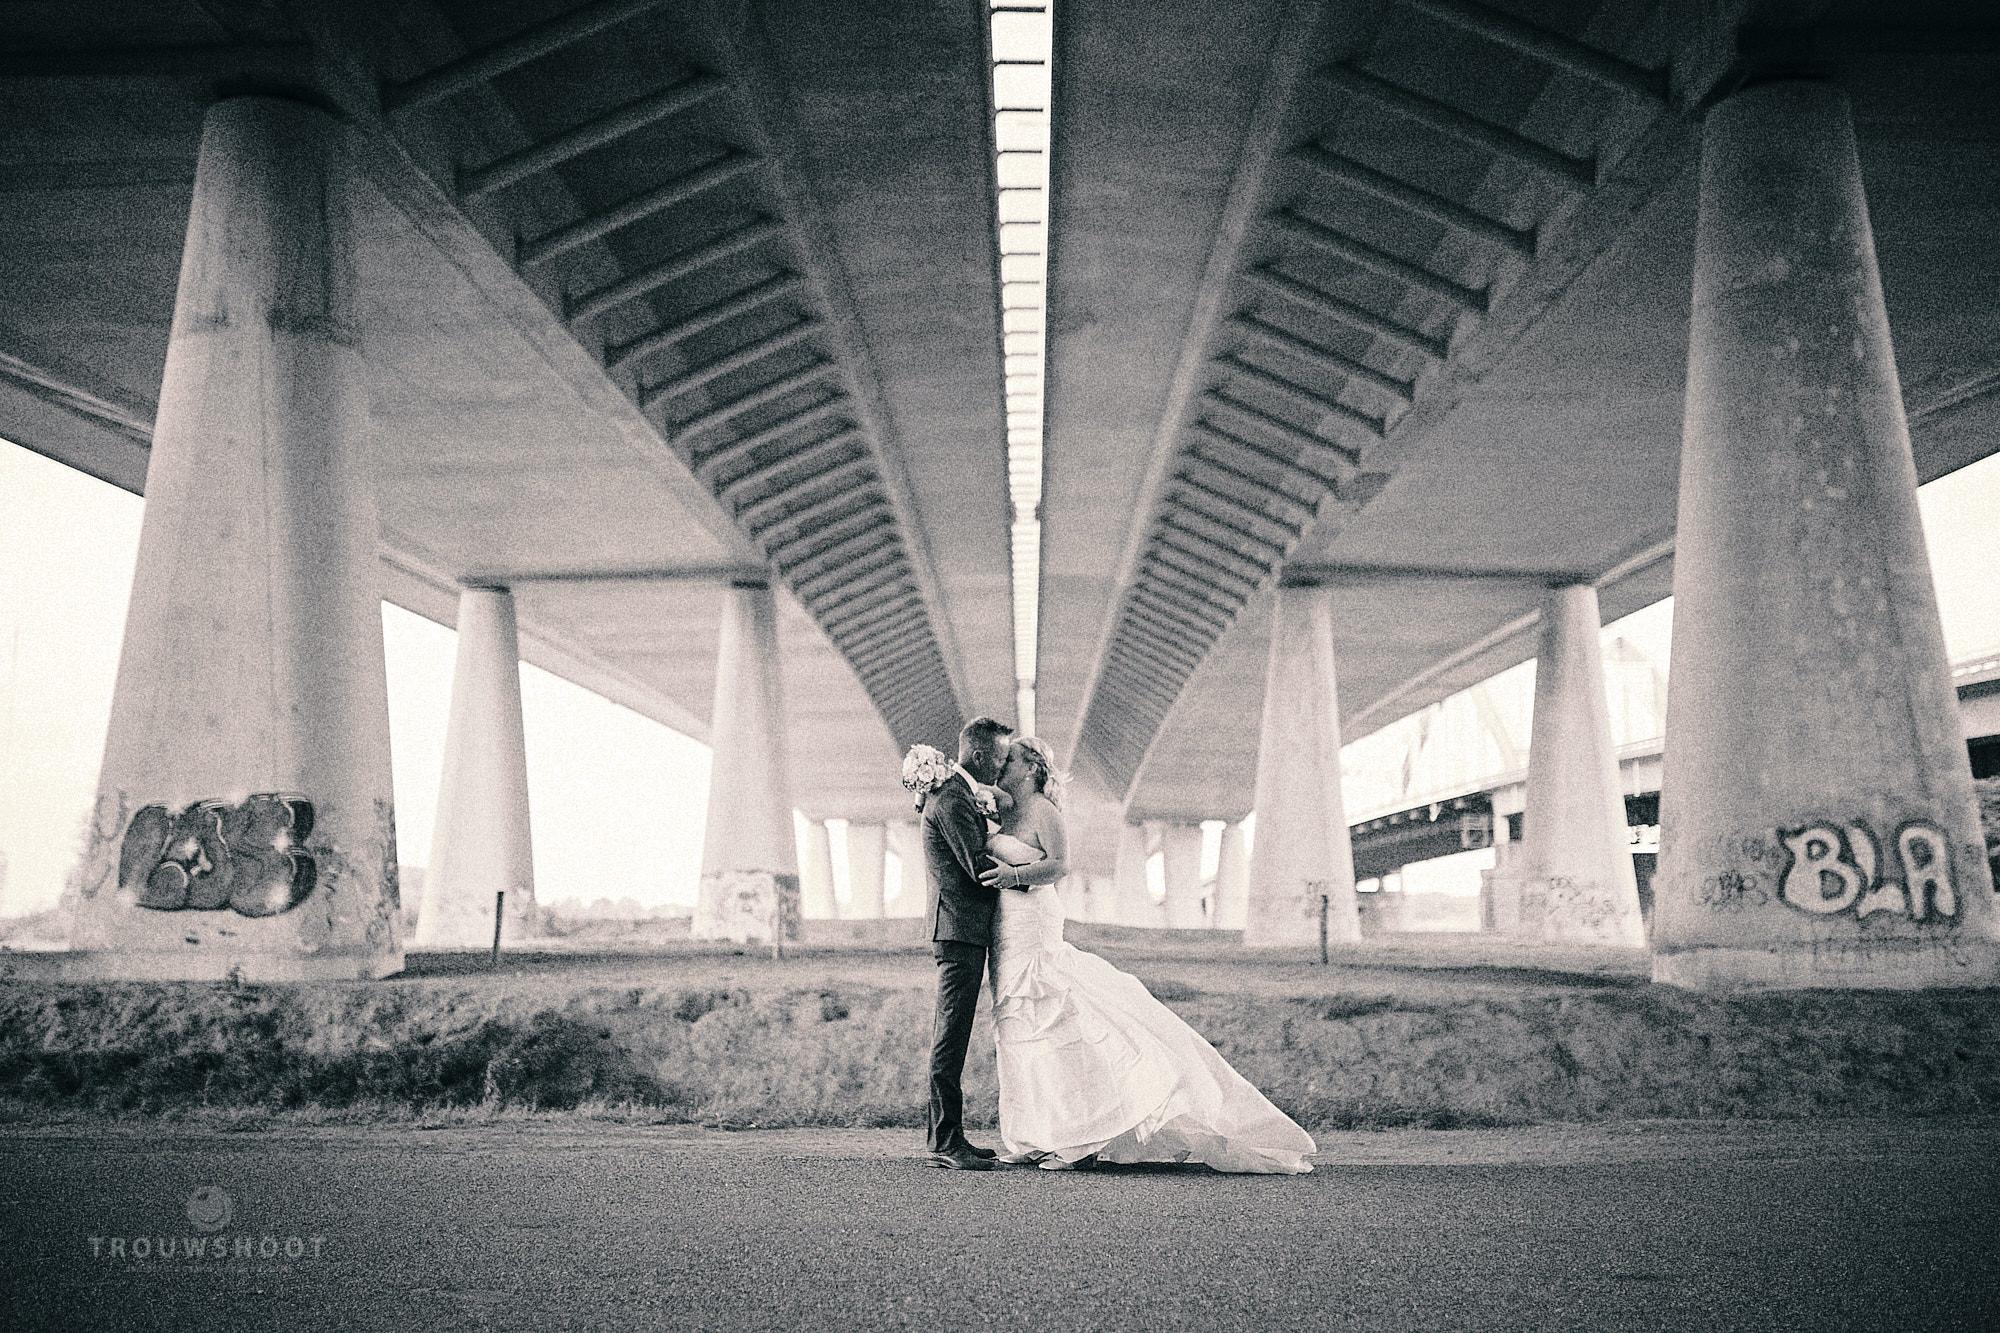 trouwshoot_bruidsfotografie_trouwfoto_312.jpg